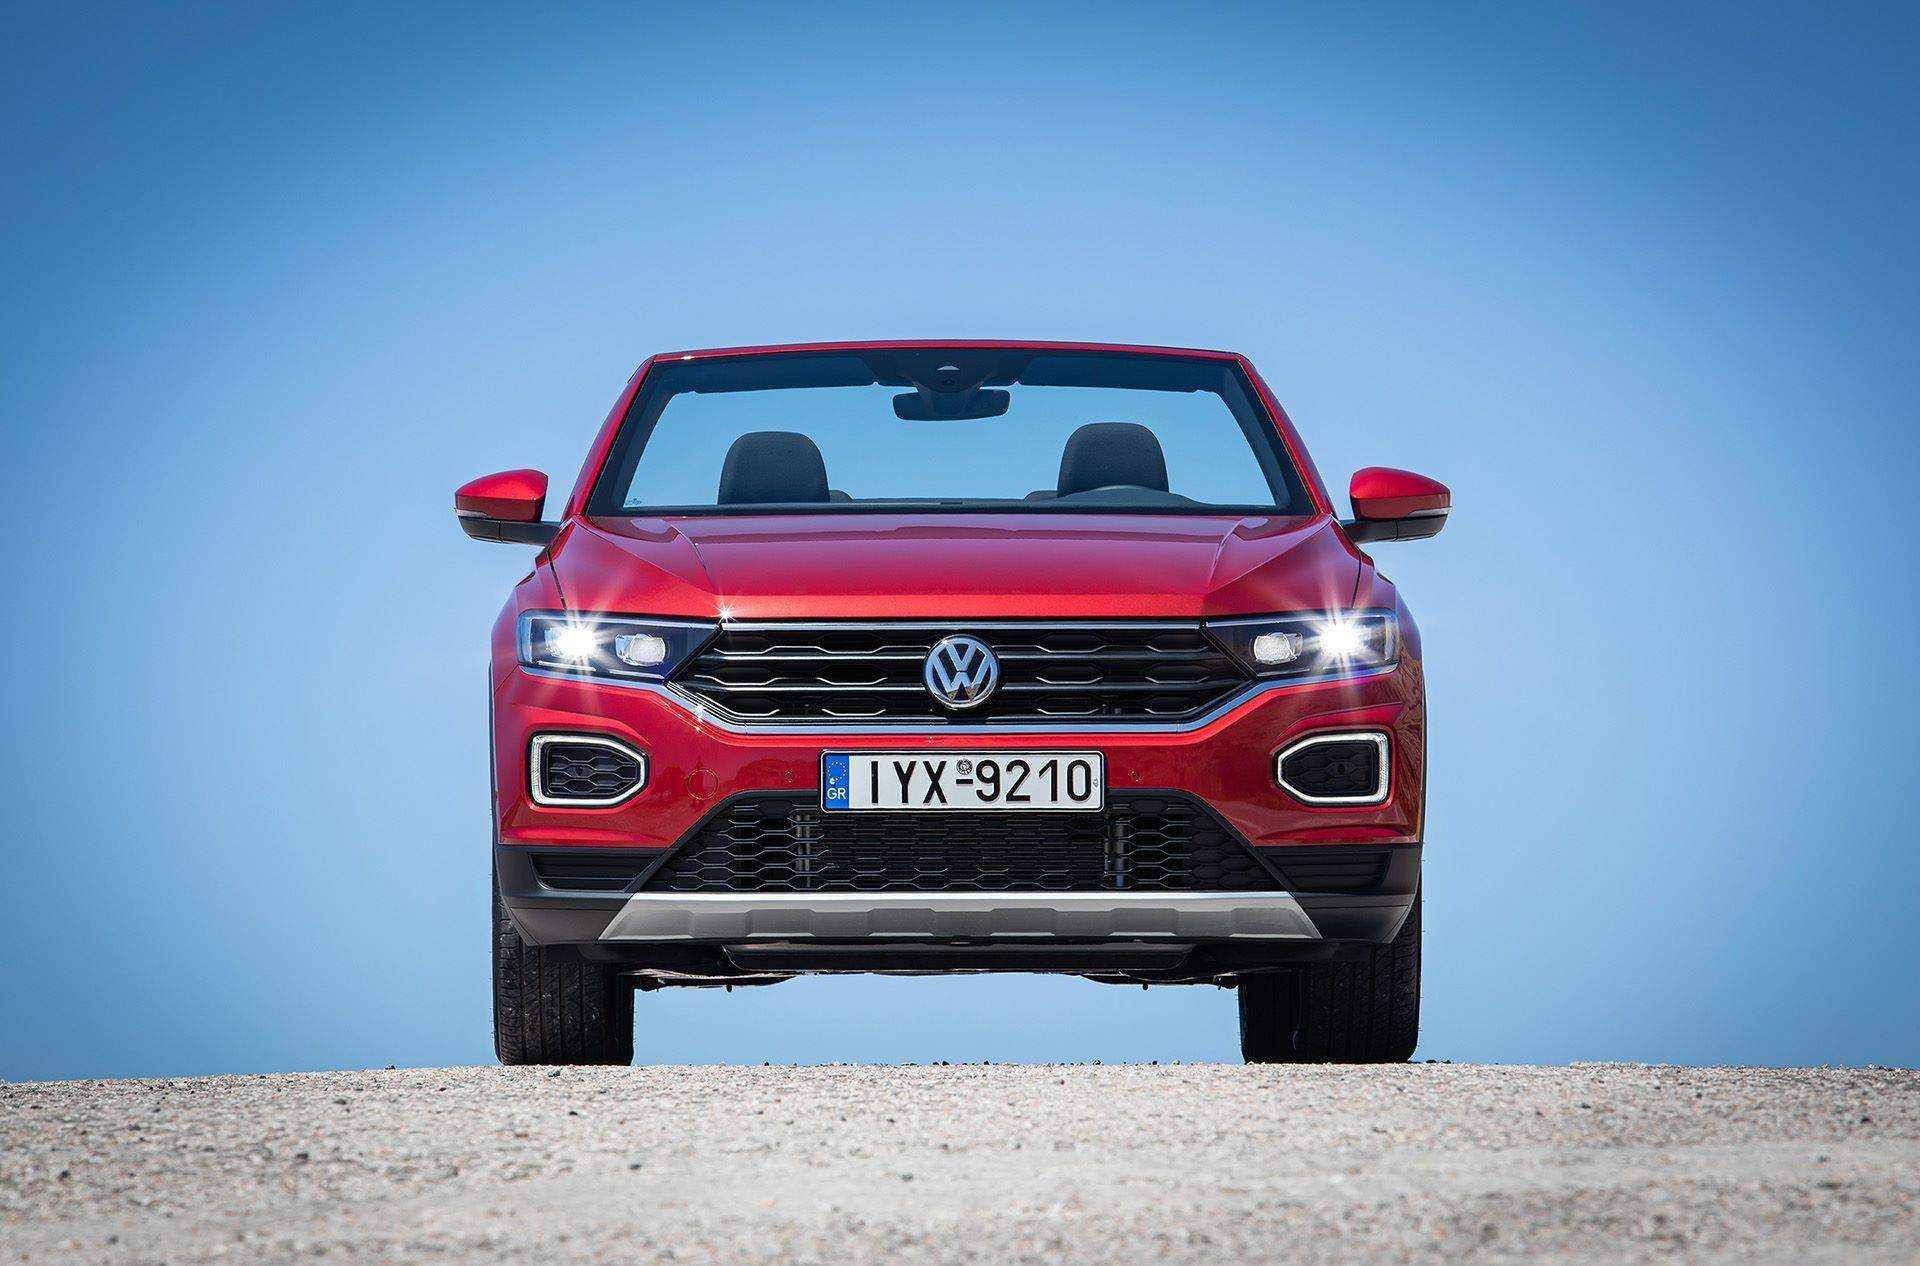 Volkswagen-T-Roc-Cabriolet-Greece-16